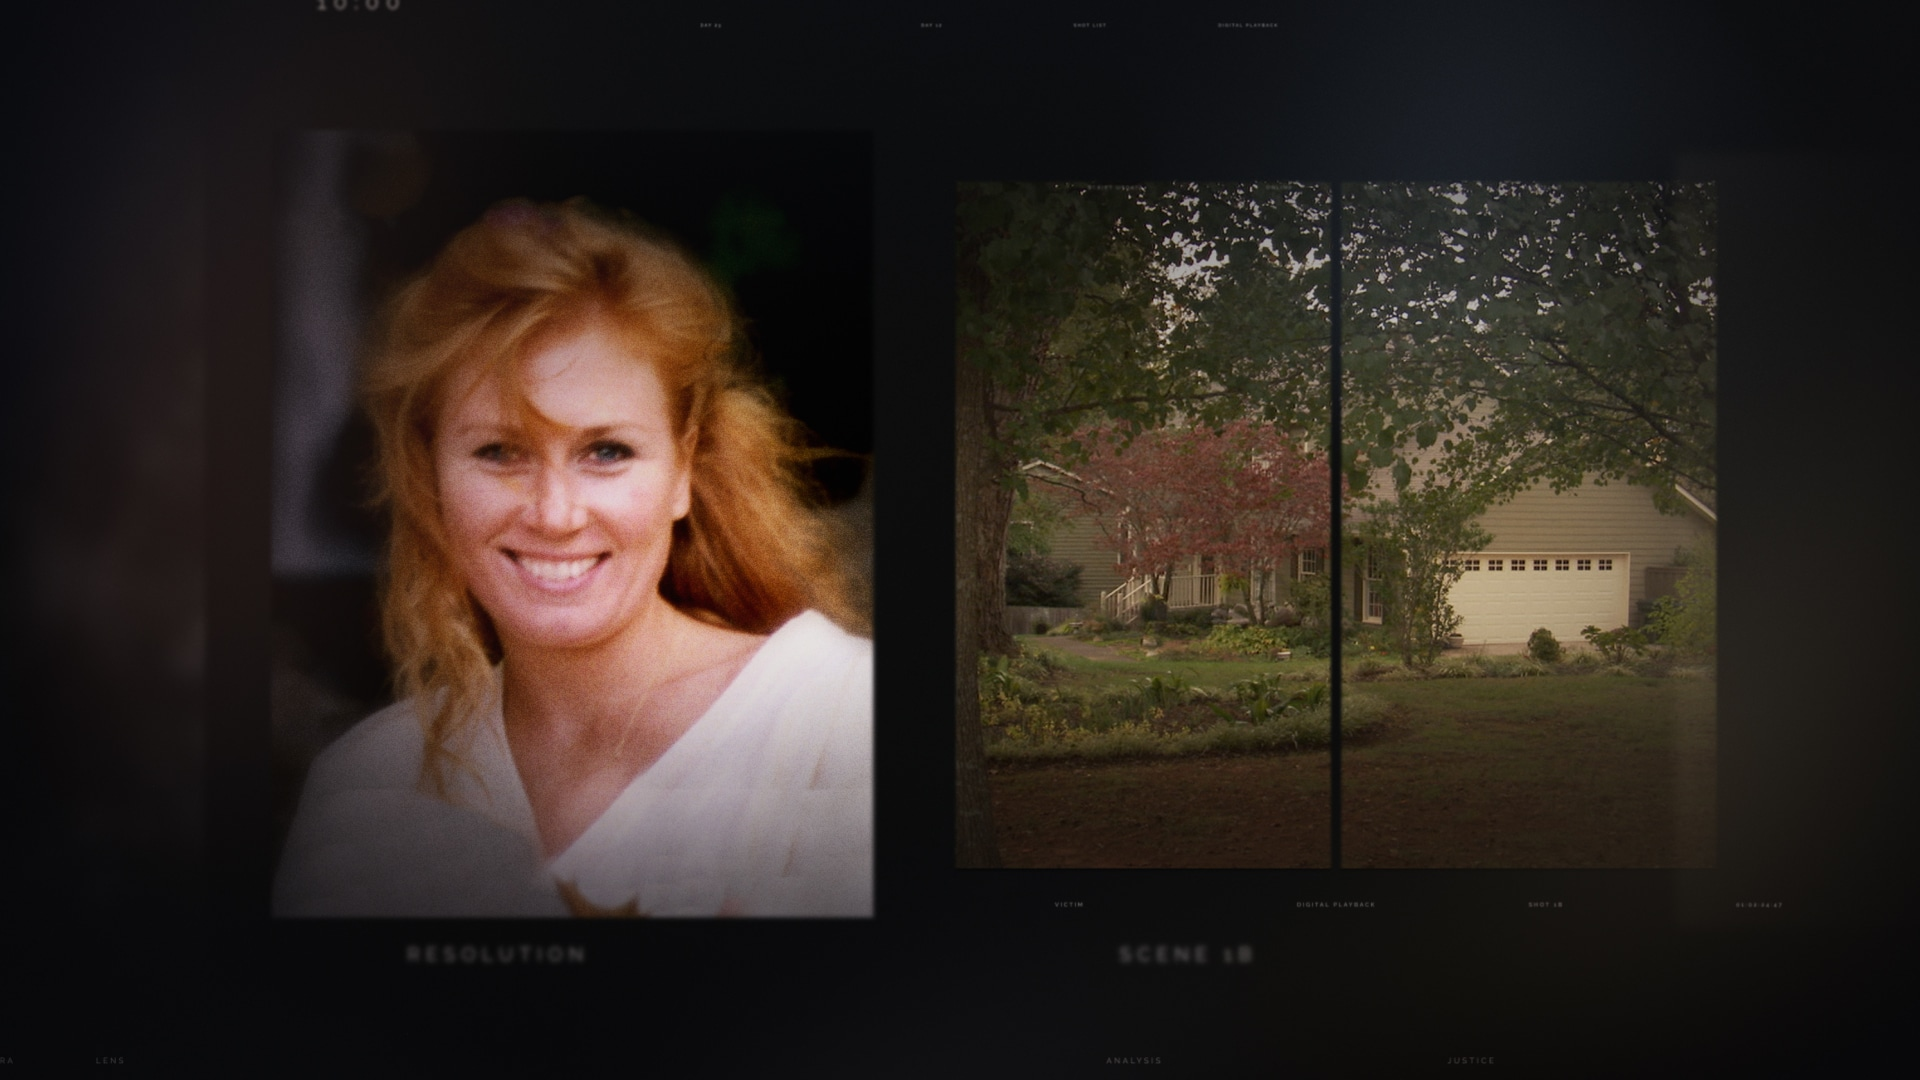 The Killing in Cobb County